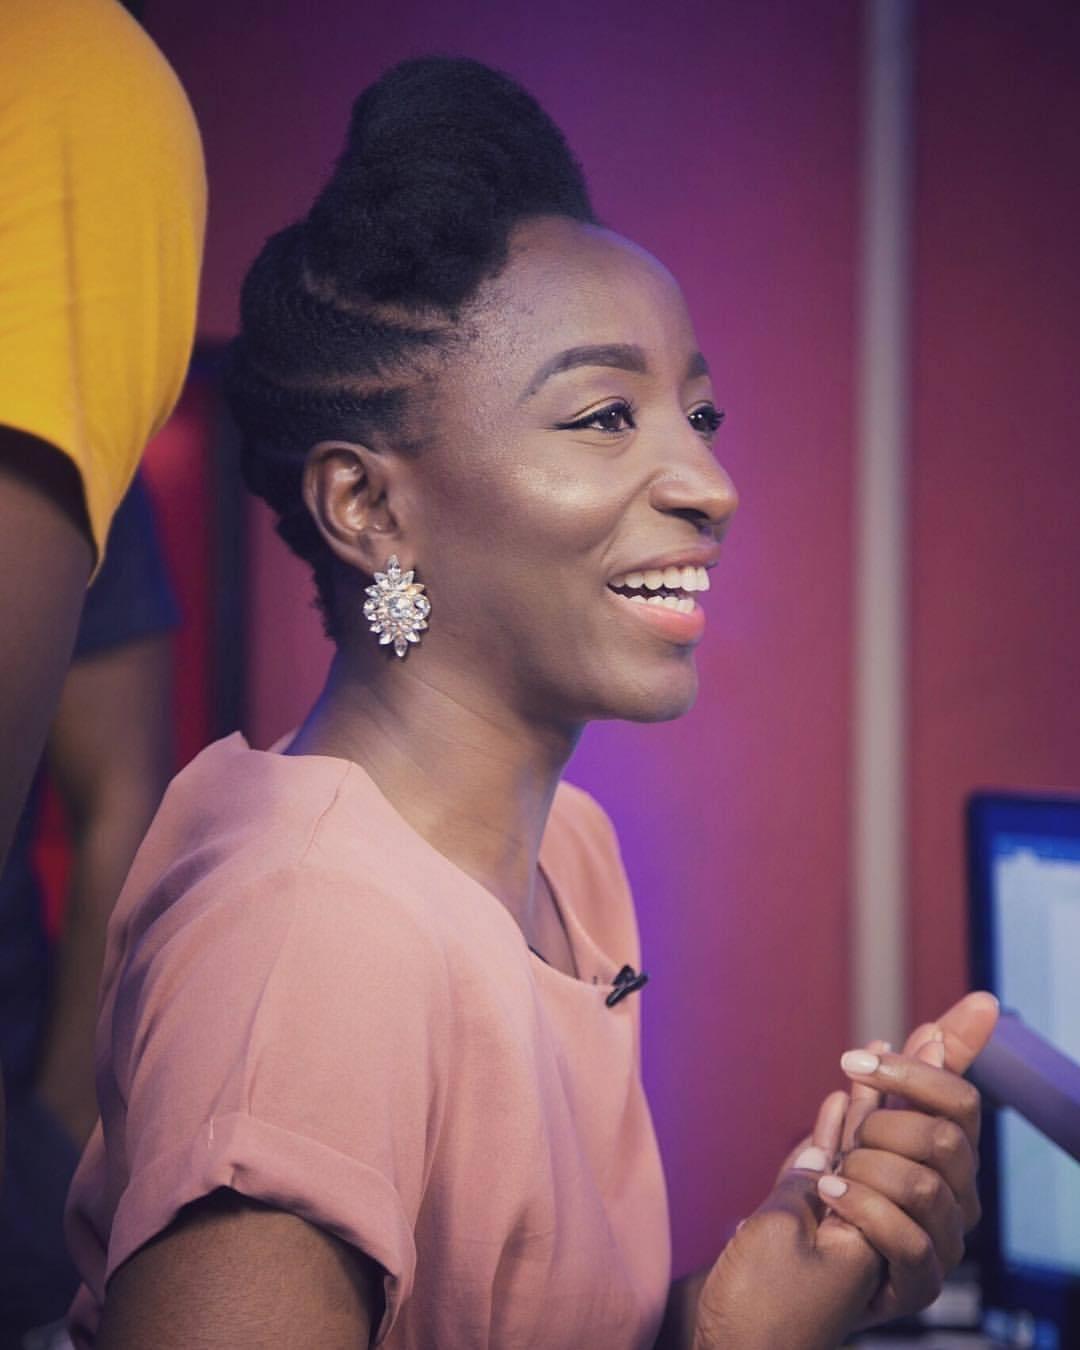 Brands a make her smile.   .  @harvellastyles x @bronzypro x @may16thphotography x @urban96fm x @ebonylifetv   👗💄📸🎧🎬 (at Lekki, Lagos, Nigeria)